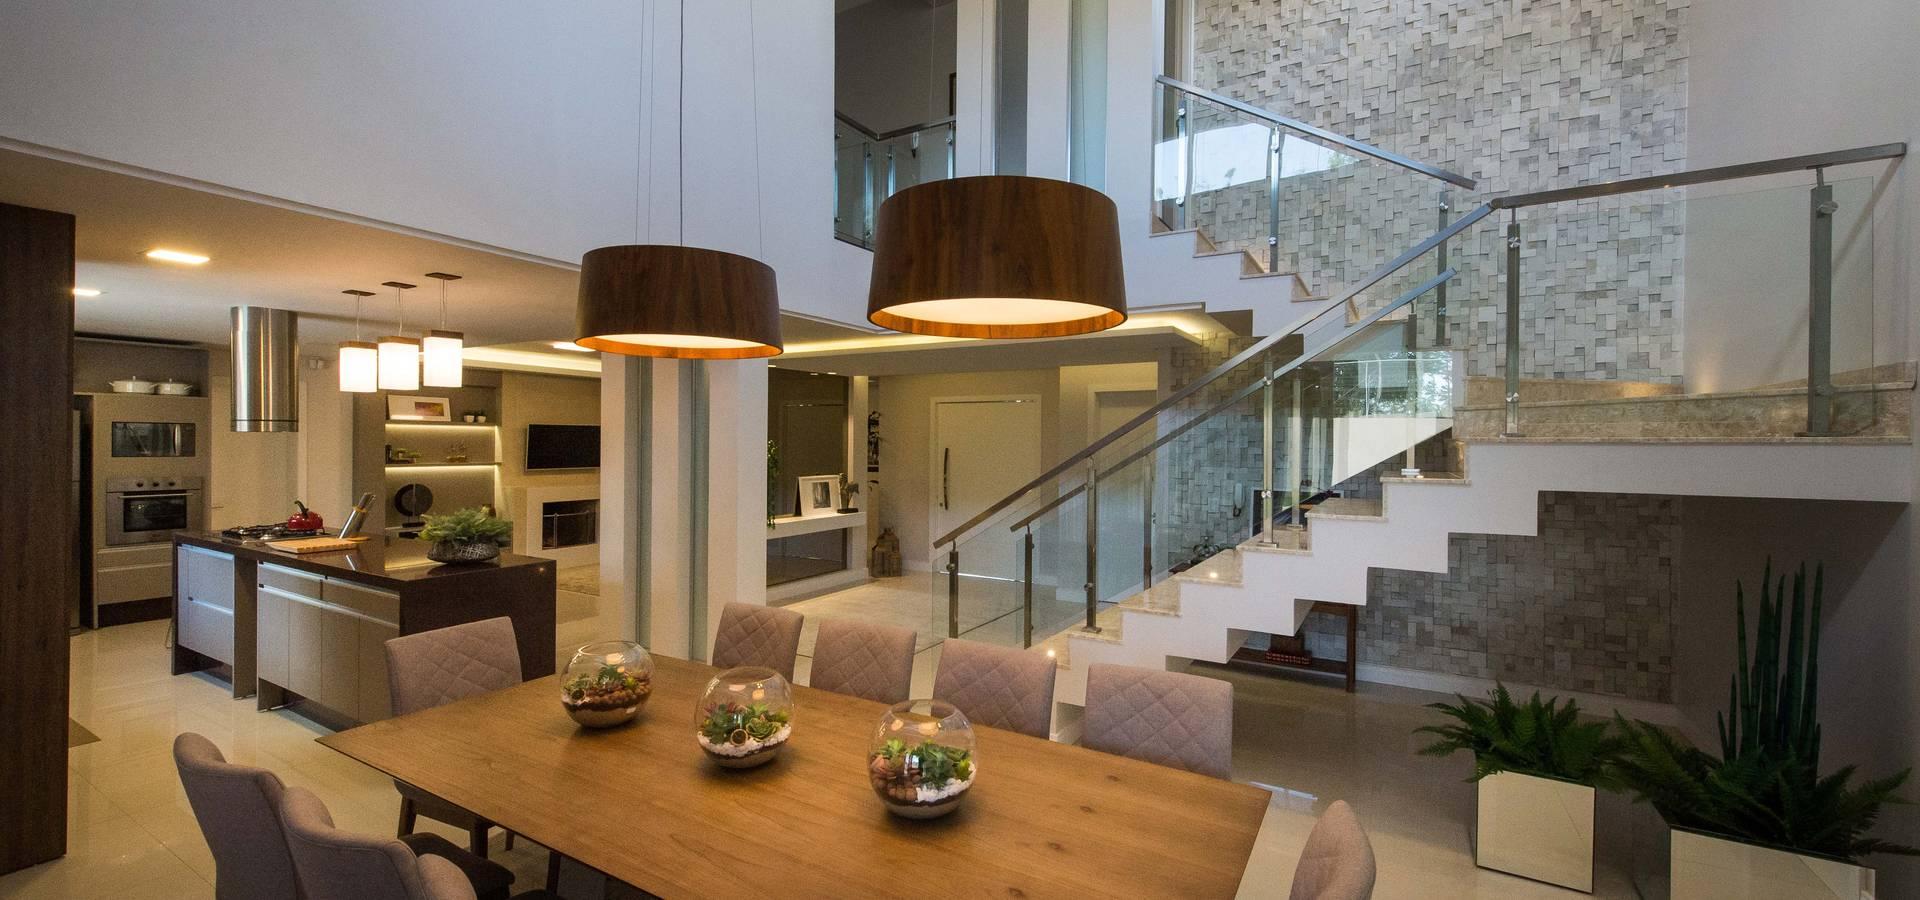 Join Arquitetura e Interiores